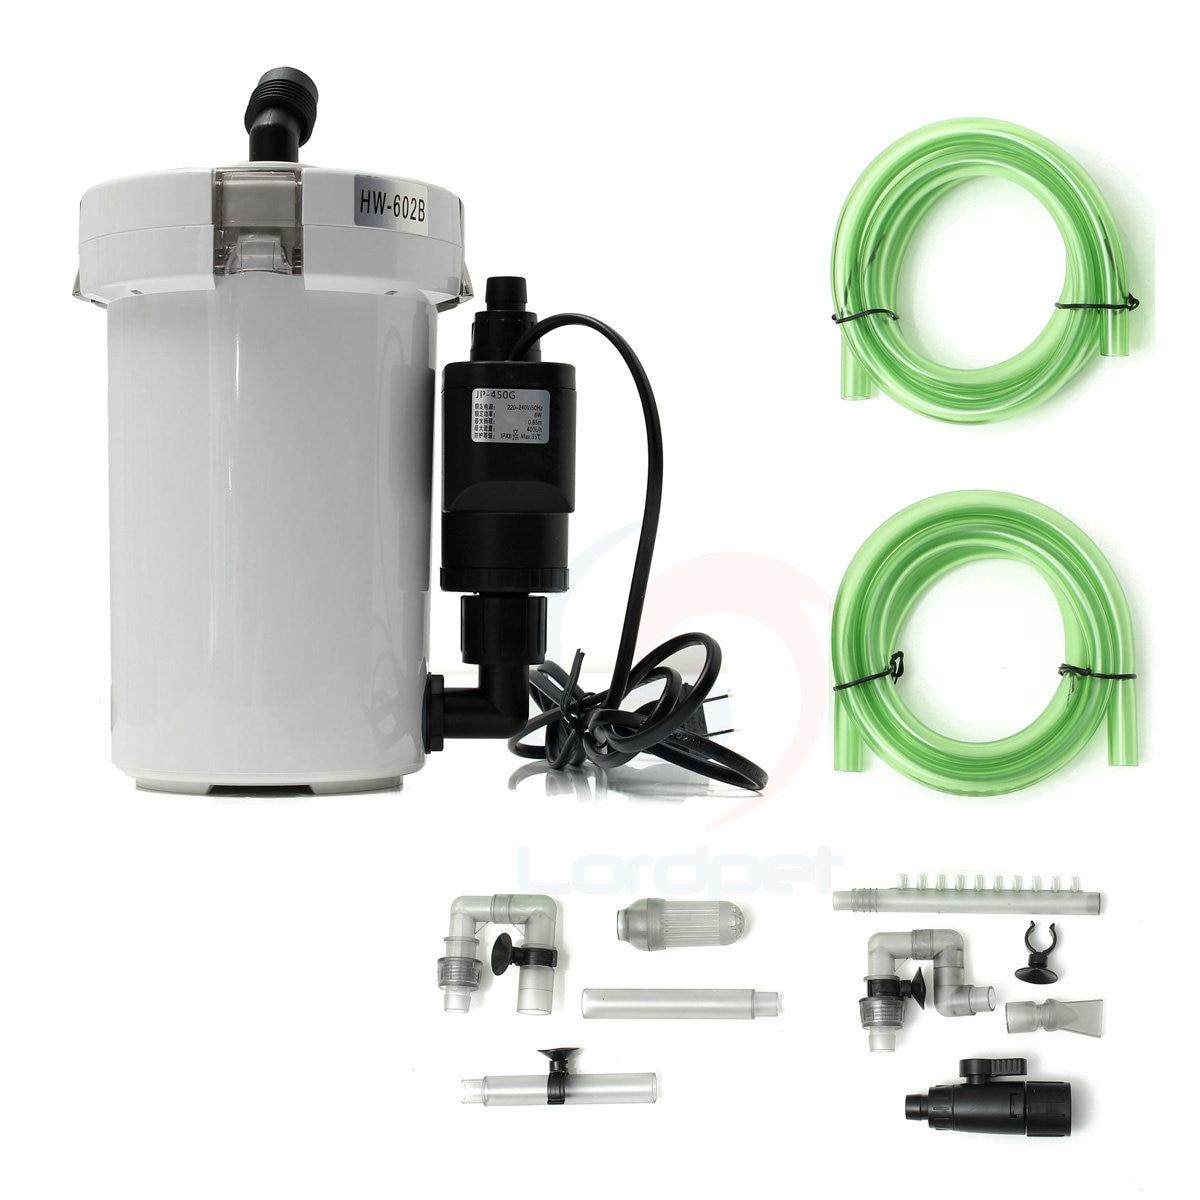 Fish tank external filter - Aliexpress Com Buy Sunsun Brand New 6w Aquarium Fish Tank External Canister Filter Table Top Hw 602b Hw 602 400l H 220v From Reliable Canister Filter